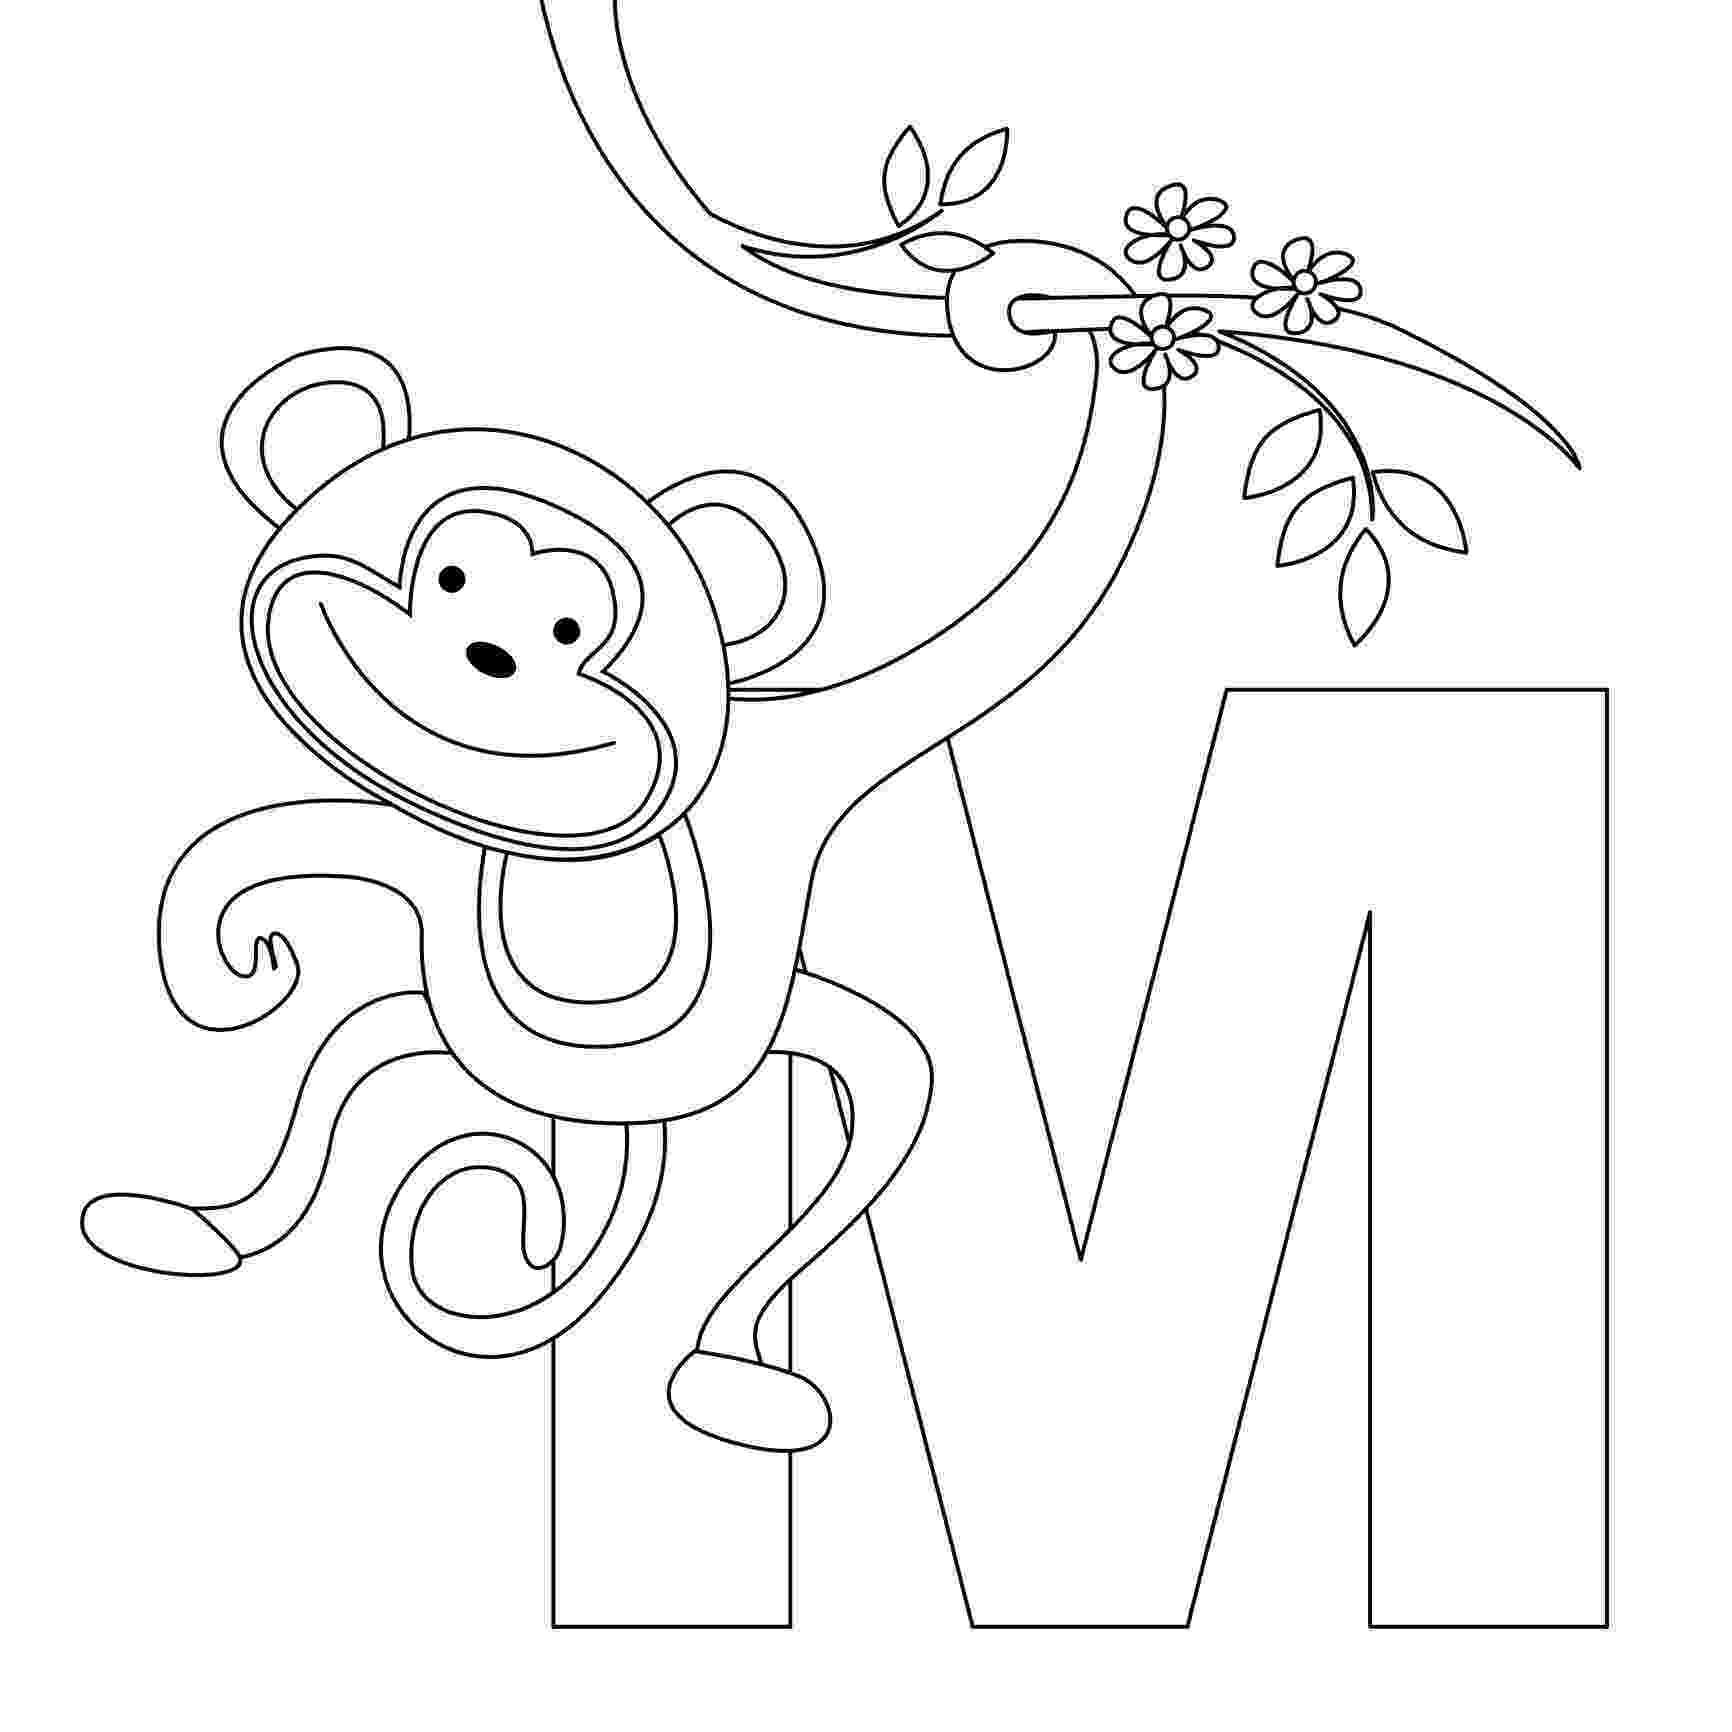 monkey colouring page free printable monkey coloring pages for kids page colouring monkey 1 1